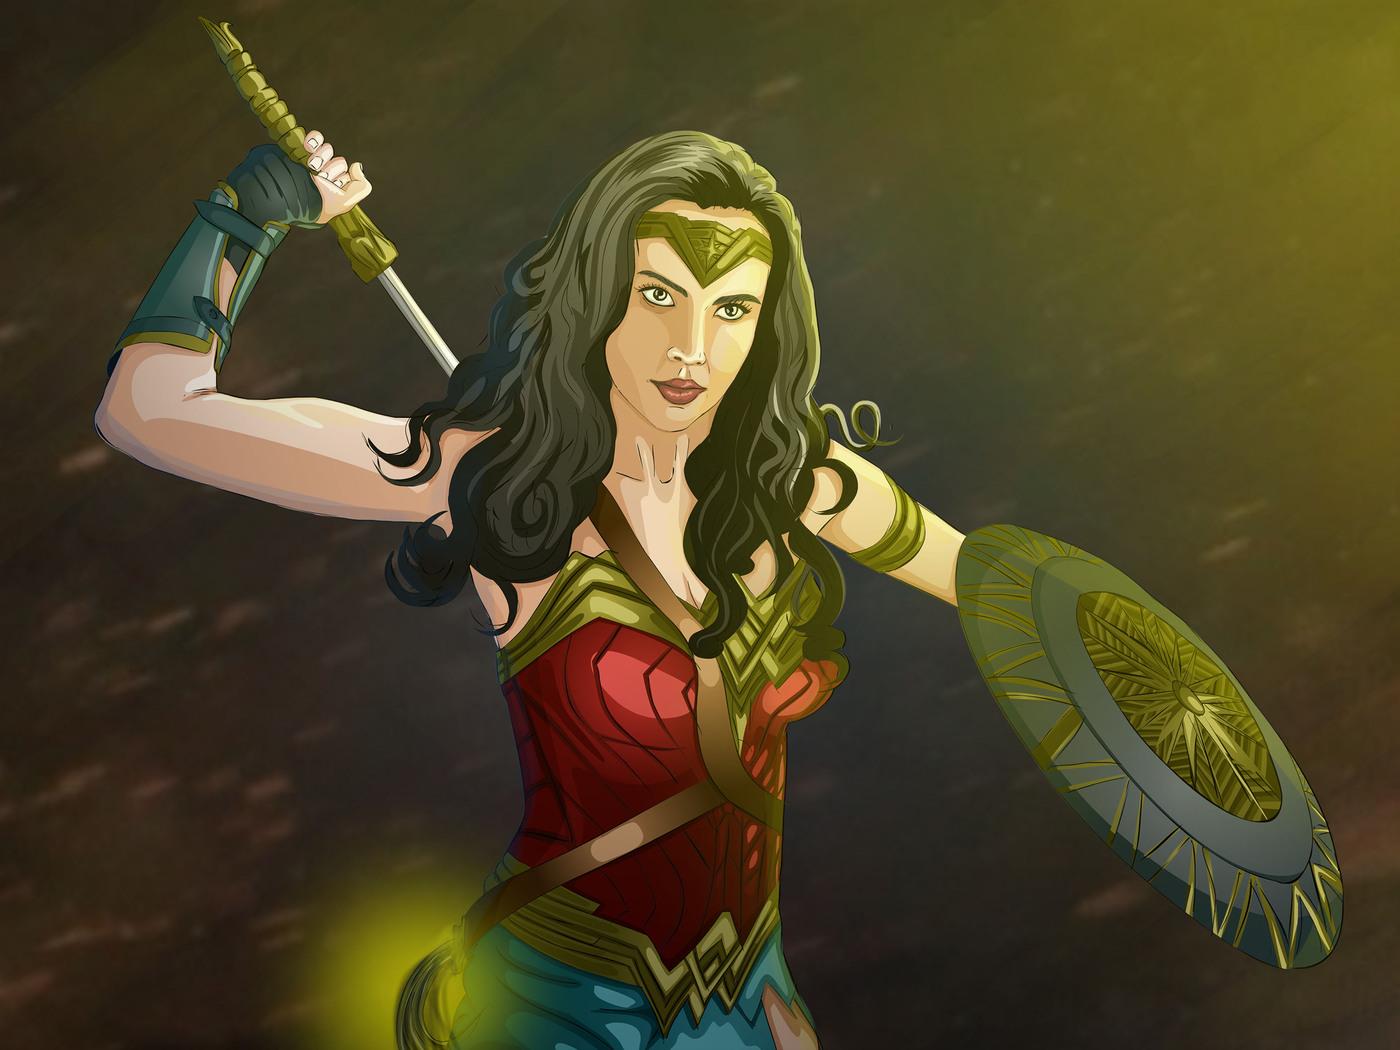 wonderwoman-4k-artwork-fm.jpg